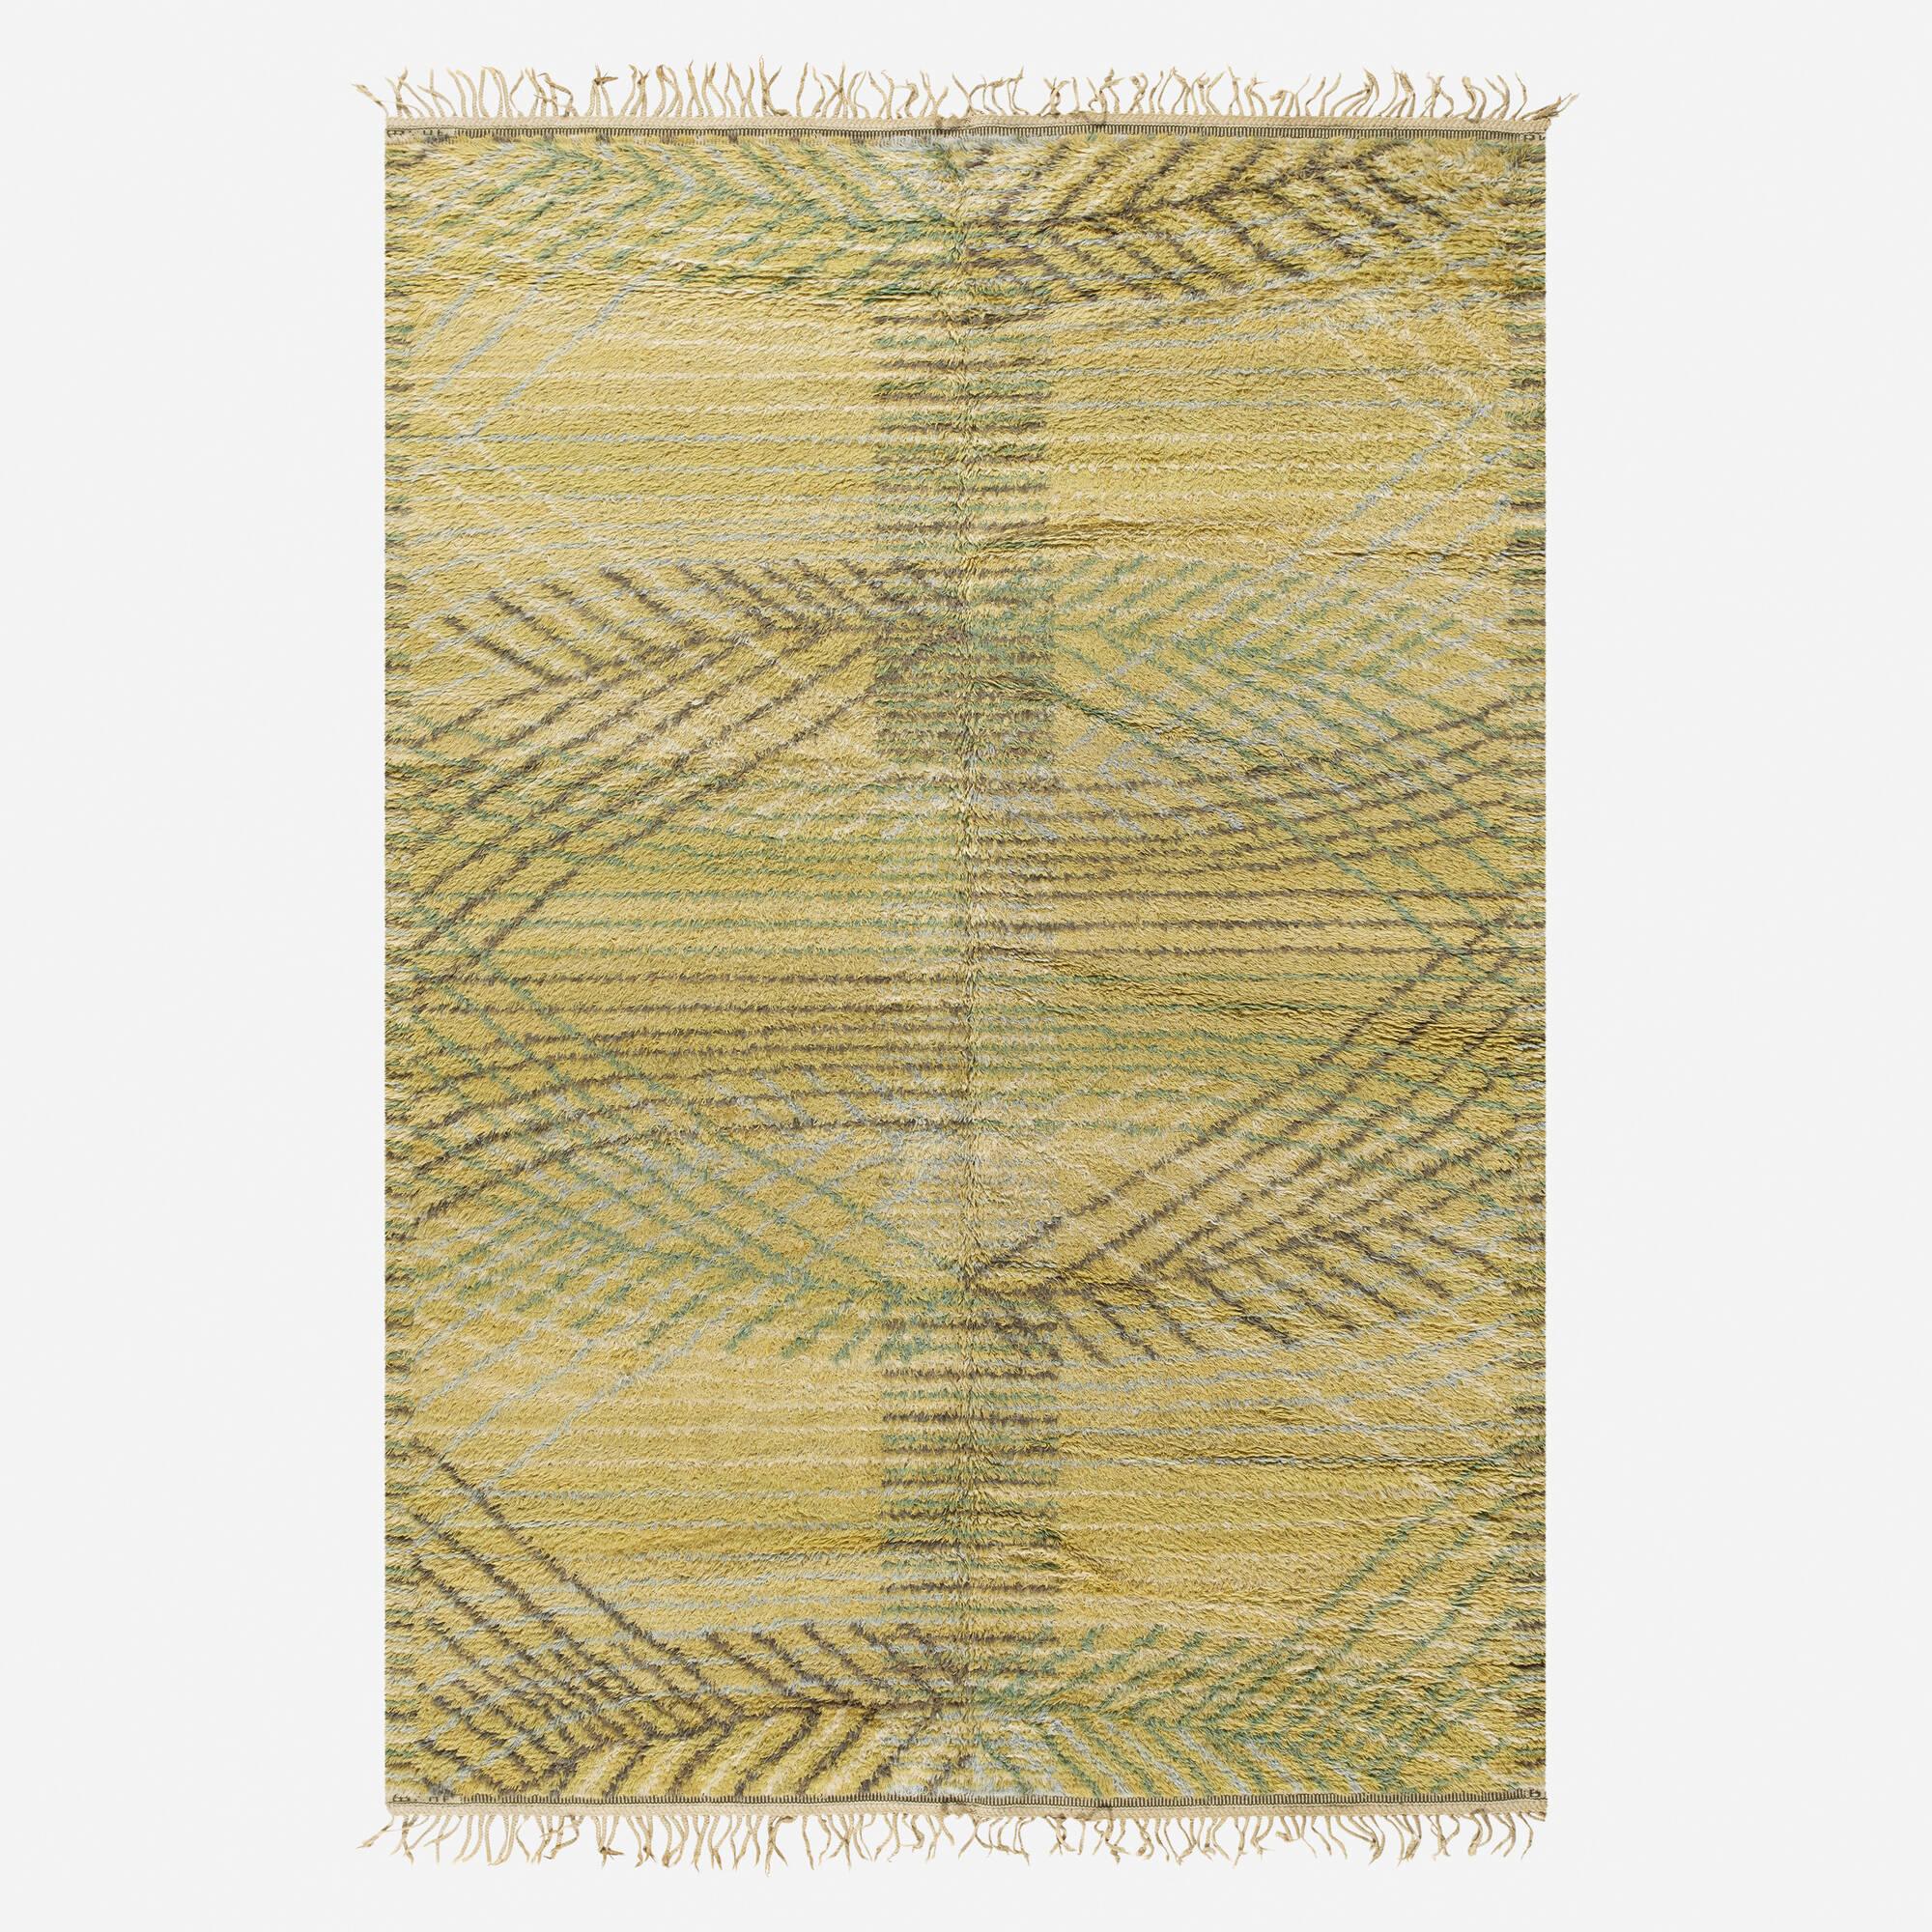 195: Barbro Nilsson / Marina rya carpet (1 of 2)